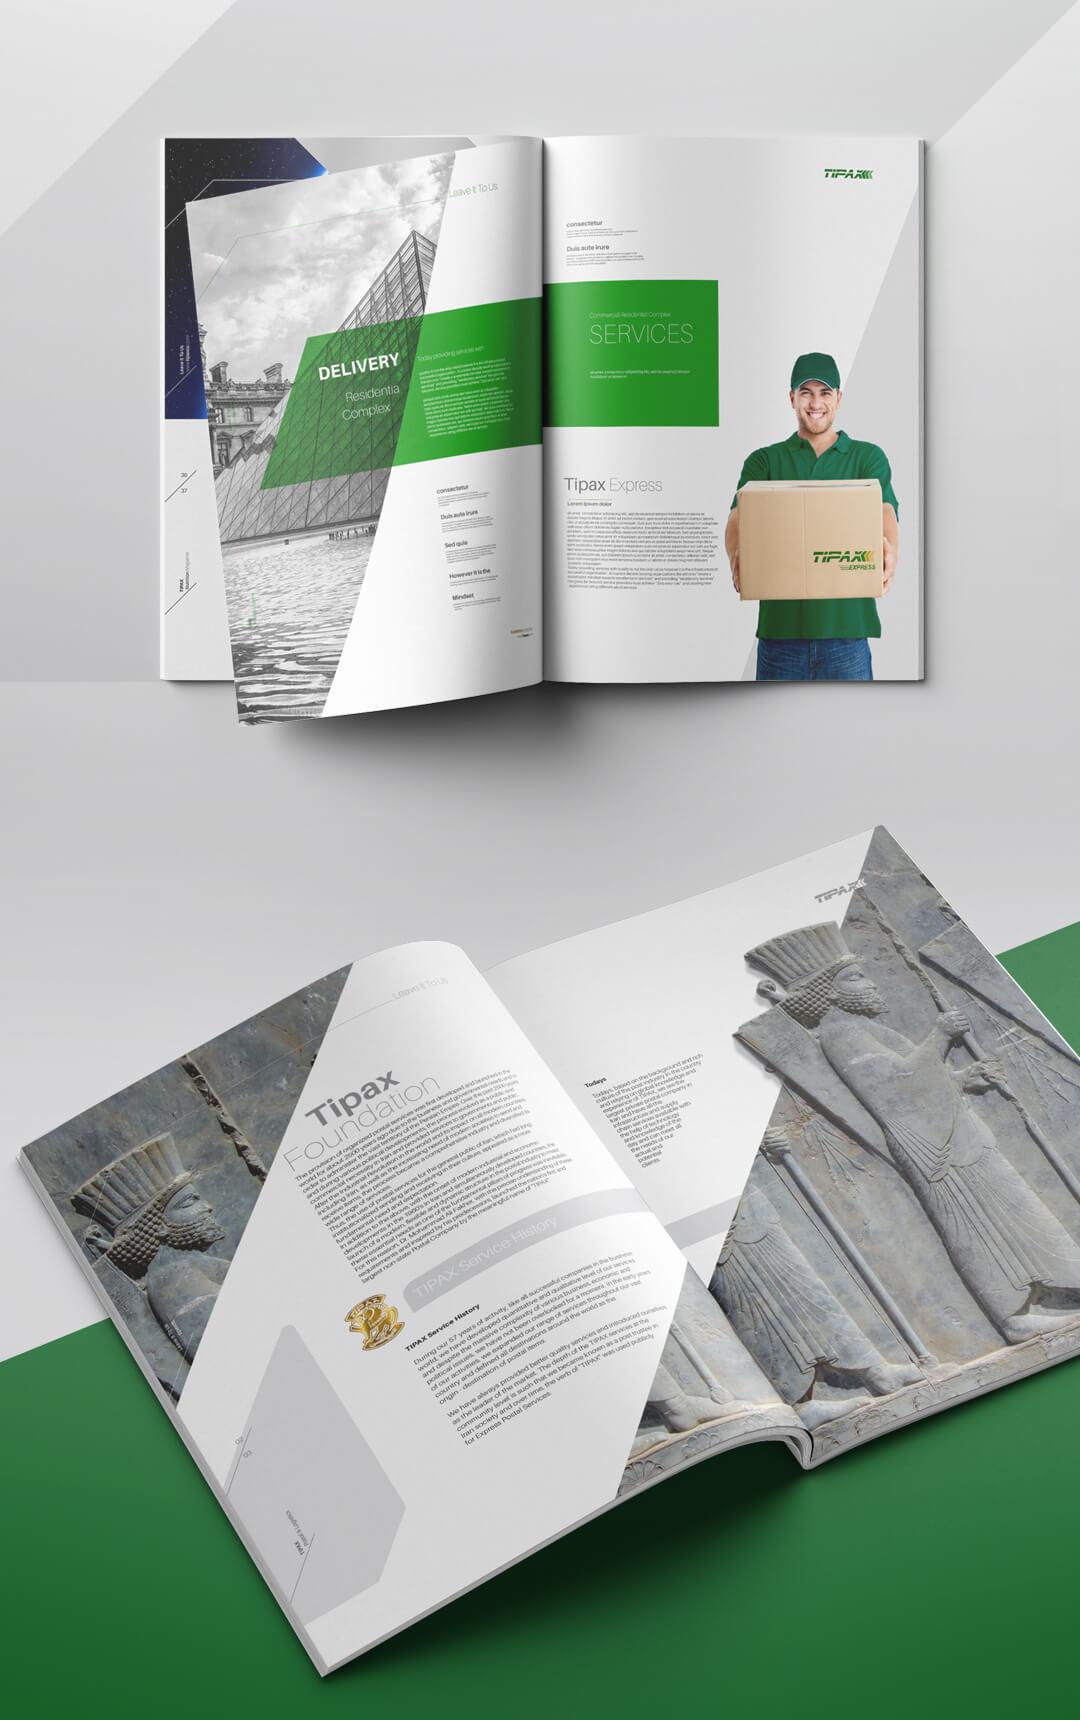 طراحی کاتالوگ تیپاکس، رسانه، تبلیغات، آژانس تبلیغاتی، هویت بصری، طراحی هویت بصری، شرکت تبلیغاتی الف، طراحی لوگو، طراحی لوگوتابپ، طراحی ست اداری، طراحی اوراق اداری، کمپین تبلیغاتی، برندینگ